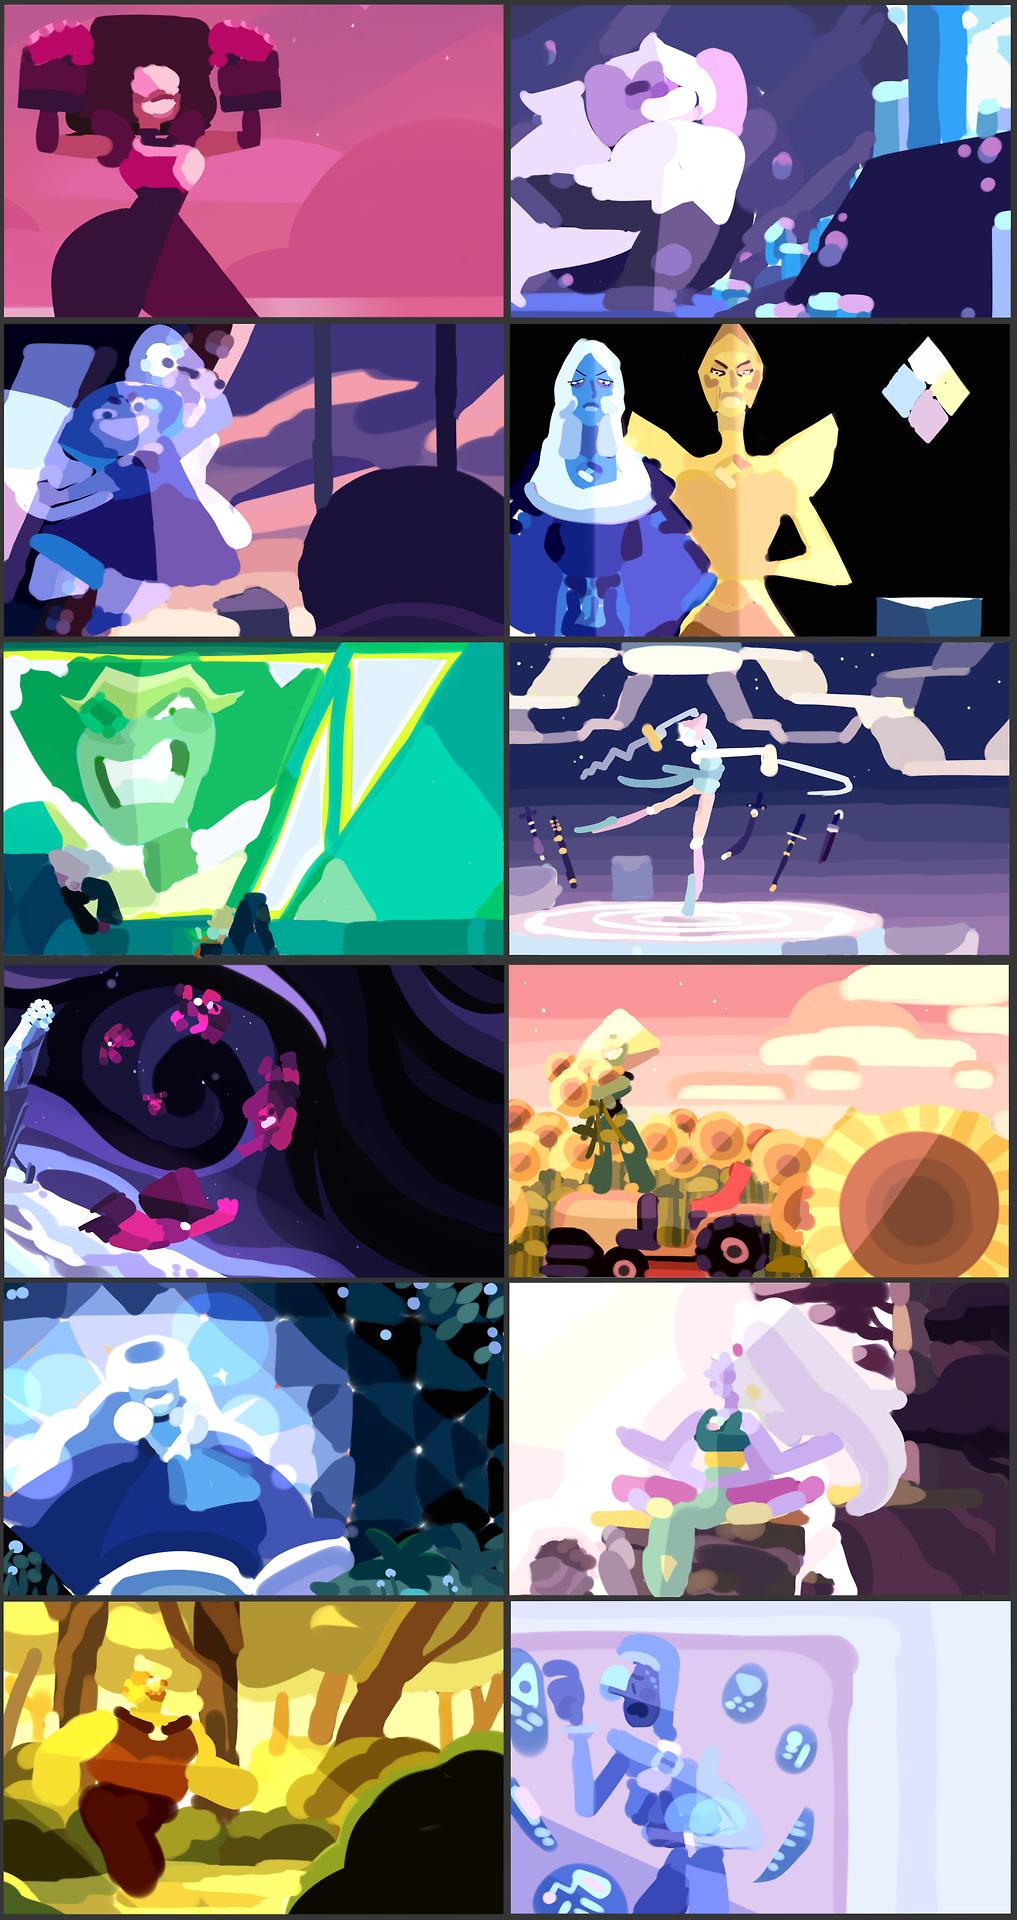 Calendar 2018 Color Schemes Color Blurbs And All Birthstones I M Doing For The Calendar Steven Universe Gem Steven Universe Fanart Steven Universe Memes